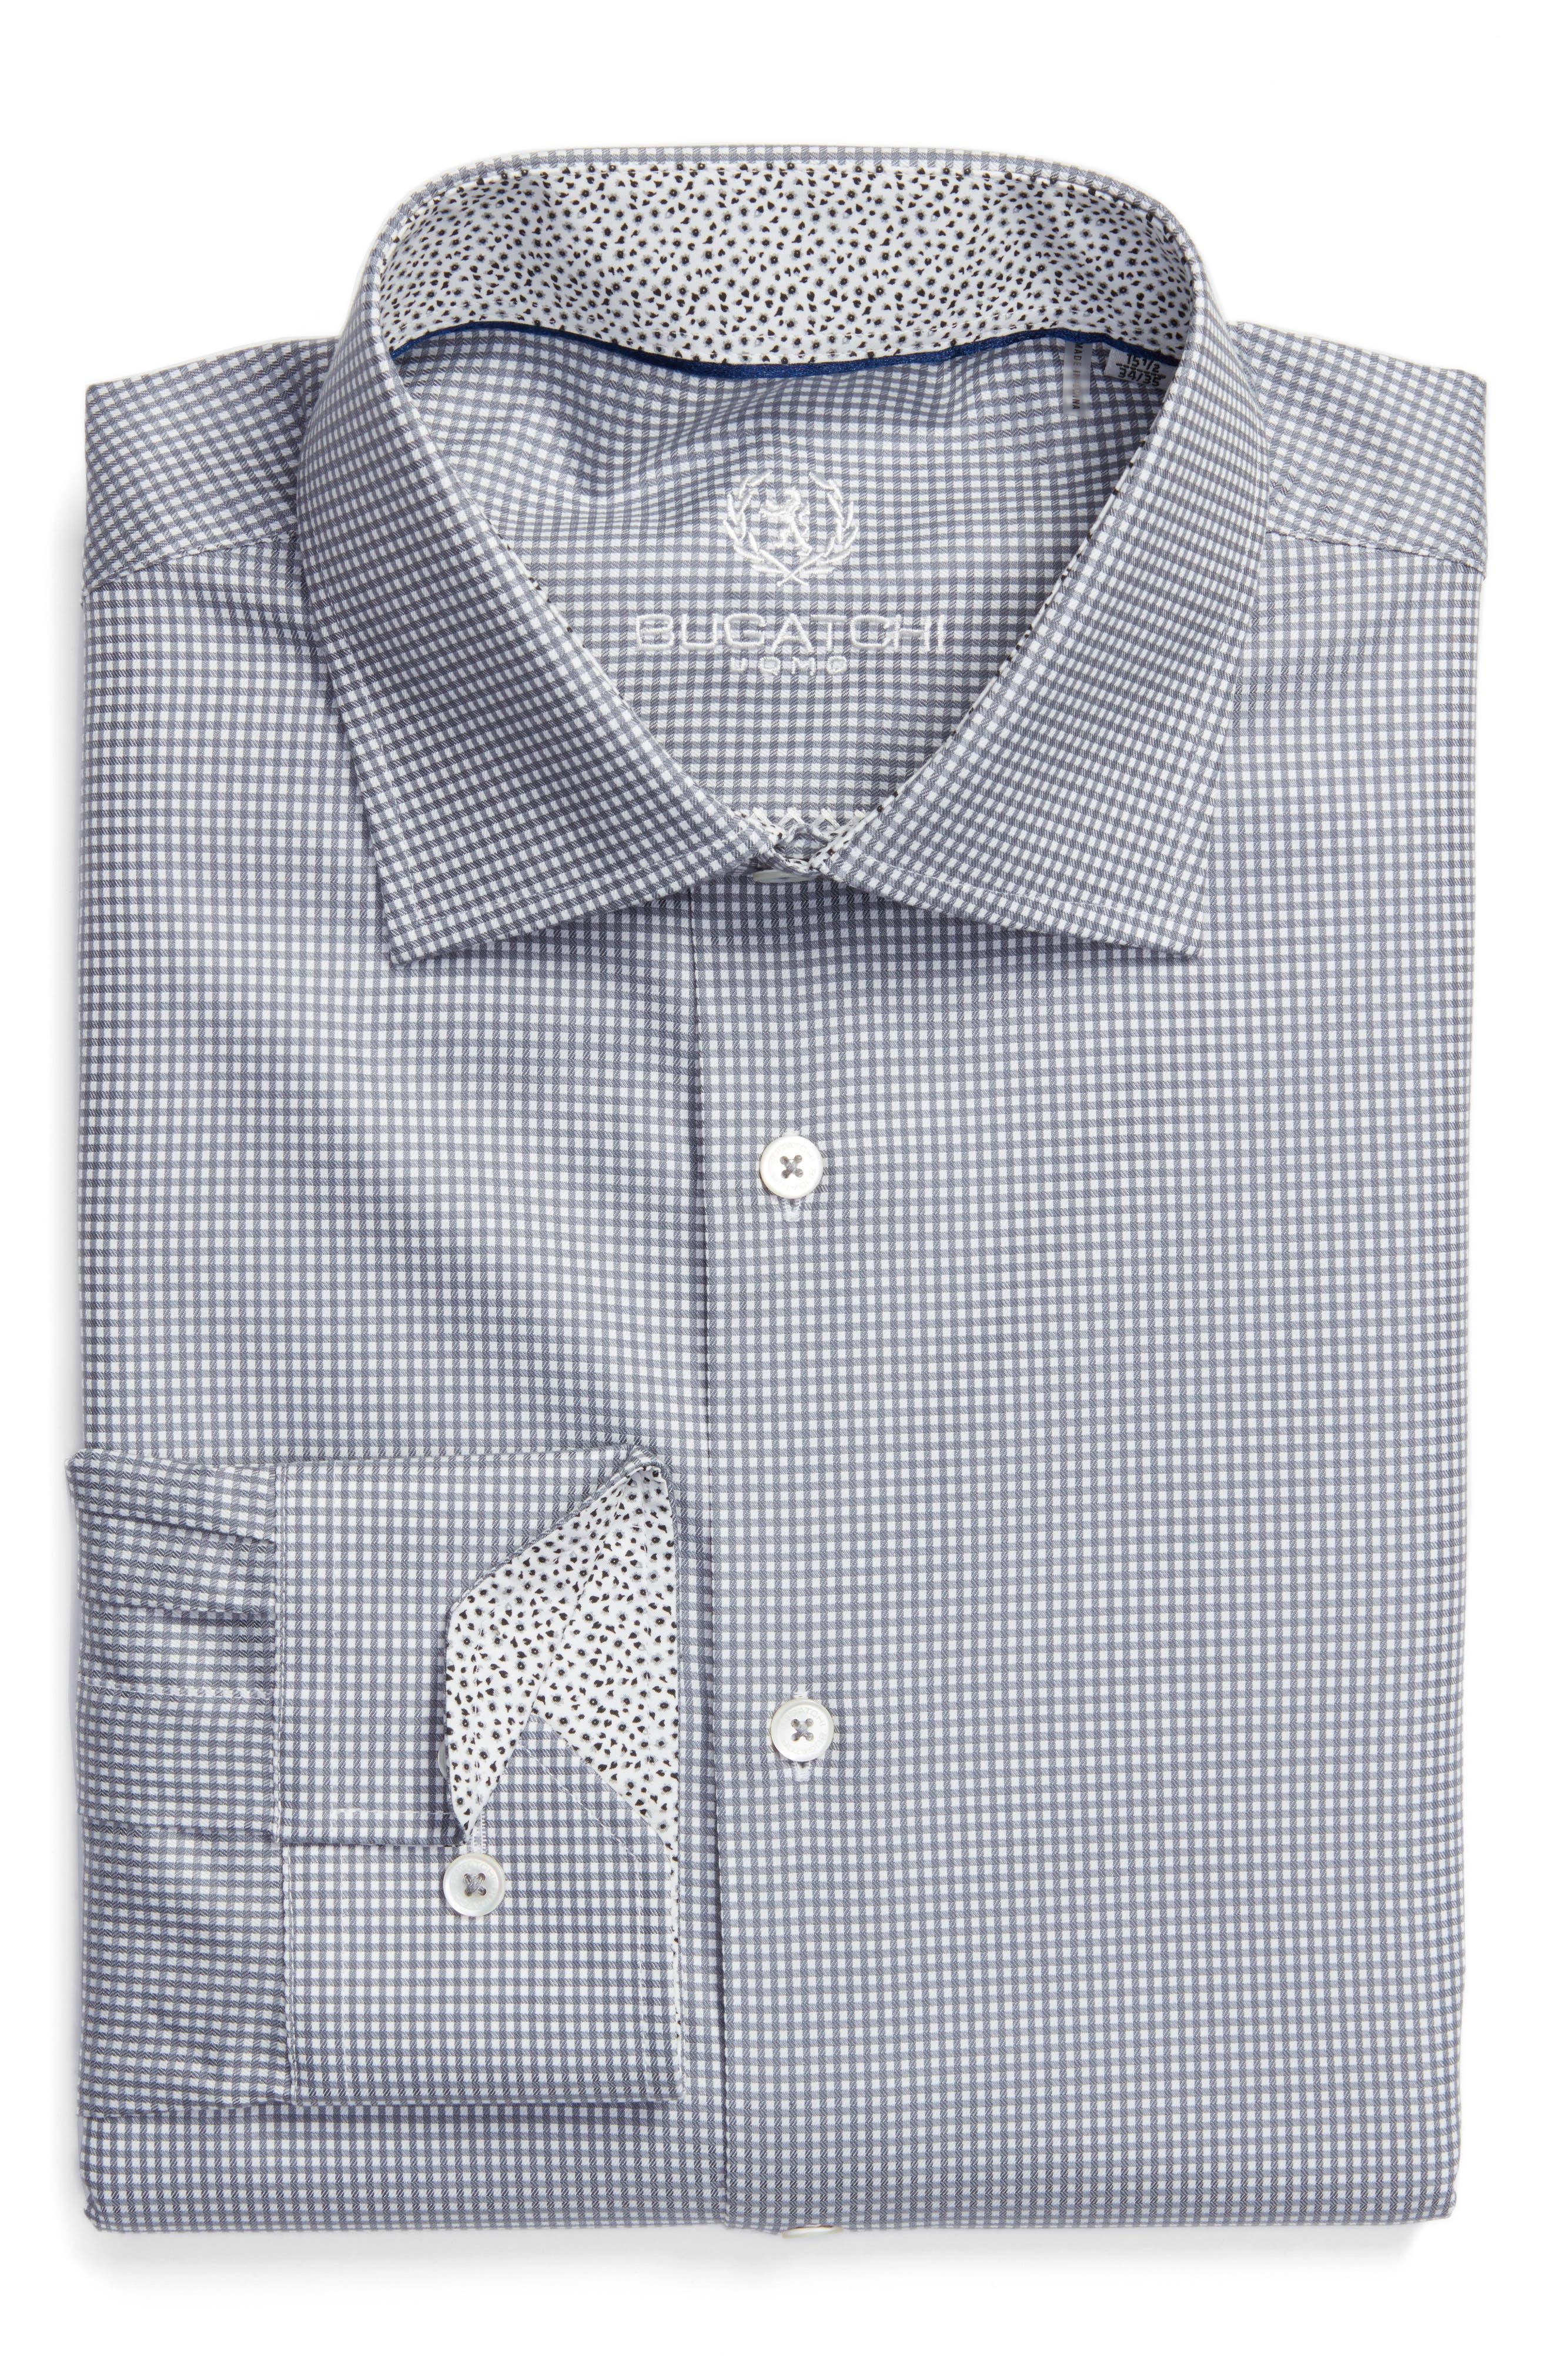 Alternate Image 1 Selected - Bugatchi Trim Fit Check Pattern Dress Shirt